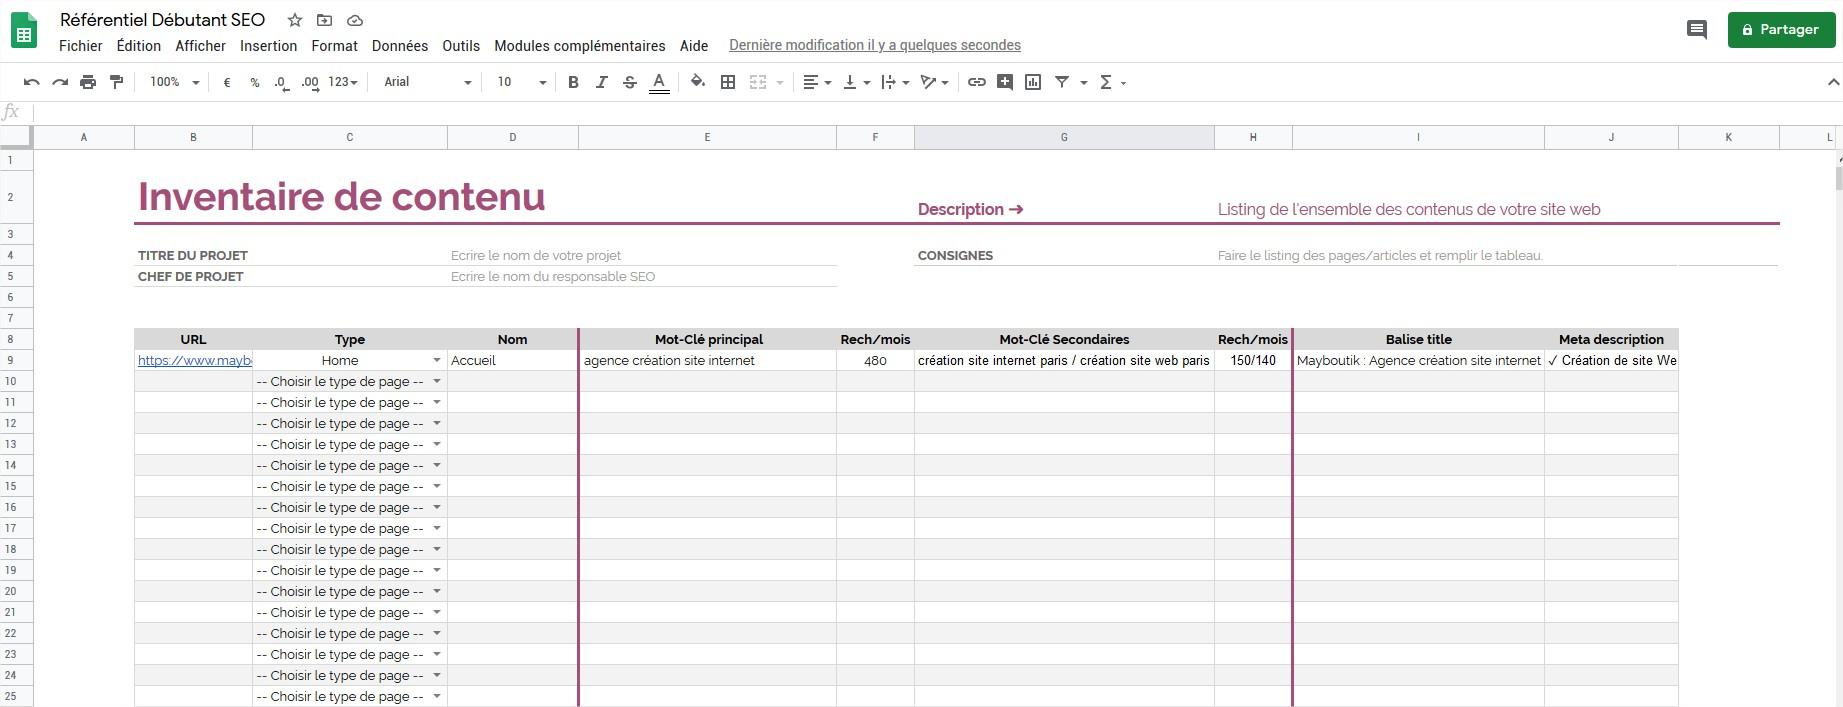 Referentiel SEO Listing Contenu